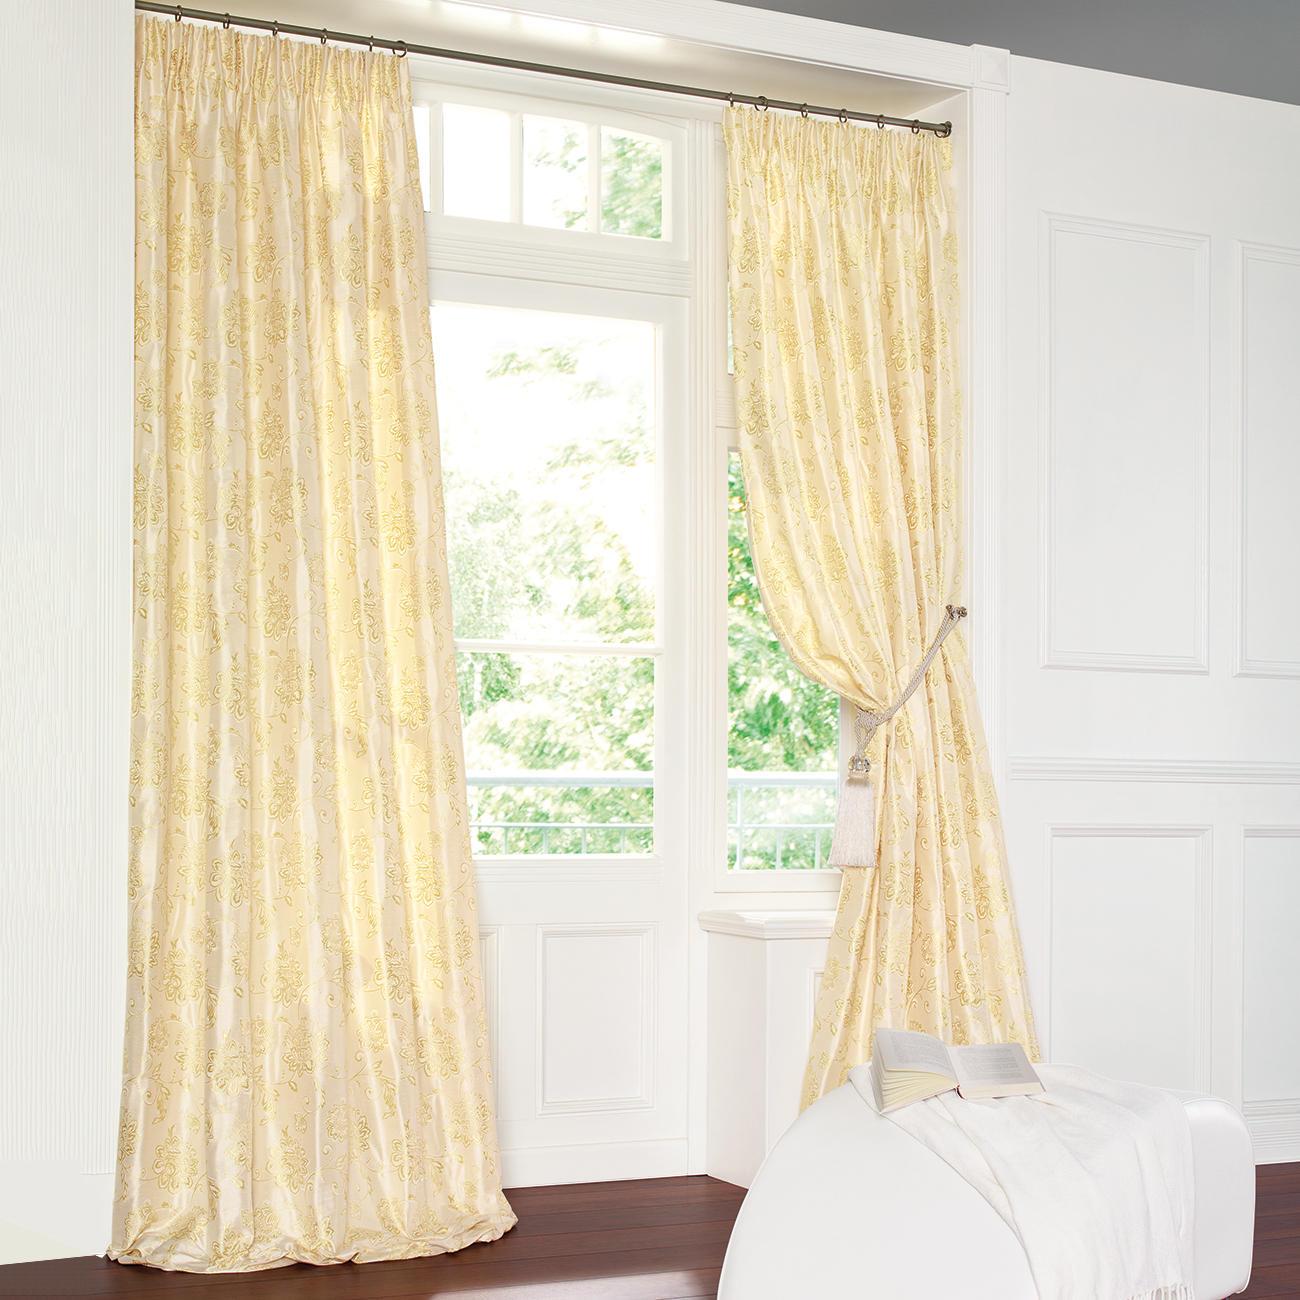 vorhang torino 1 st ck vorh nge kaufen das kavaliershaus. Black Bedroom Furniture Sets. Home Design Ideas